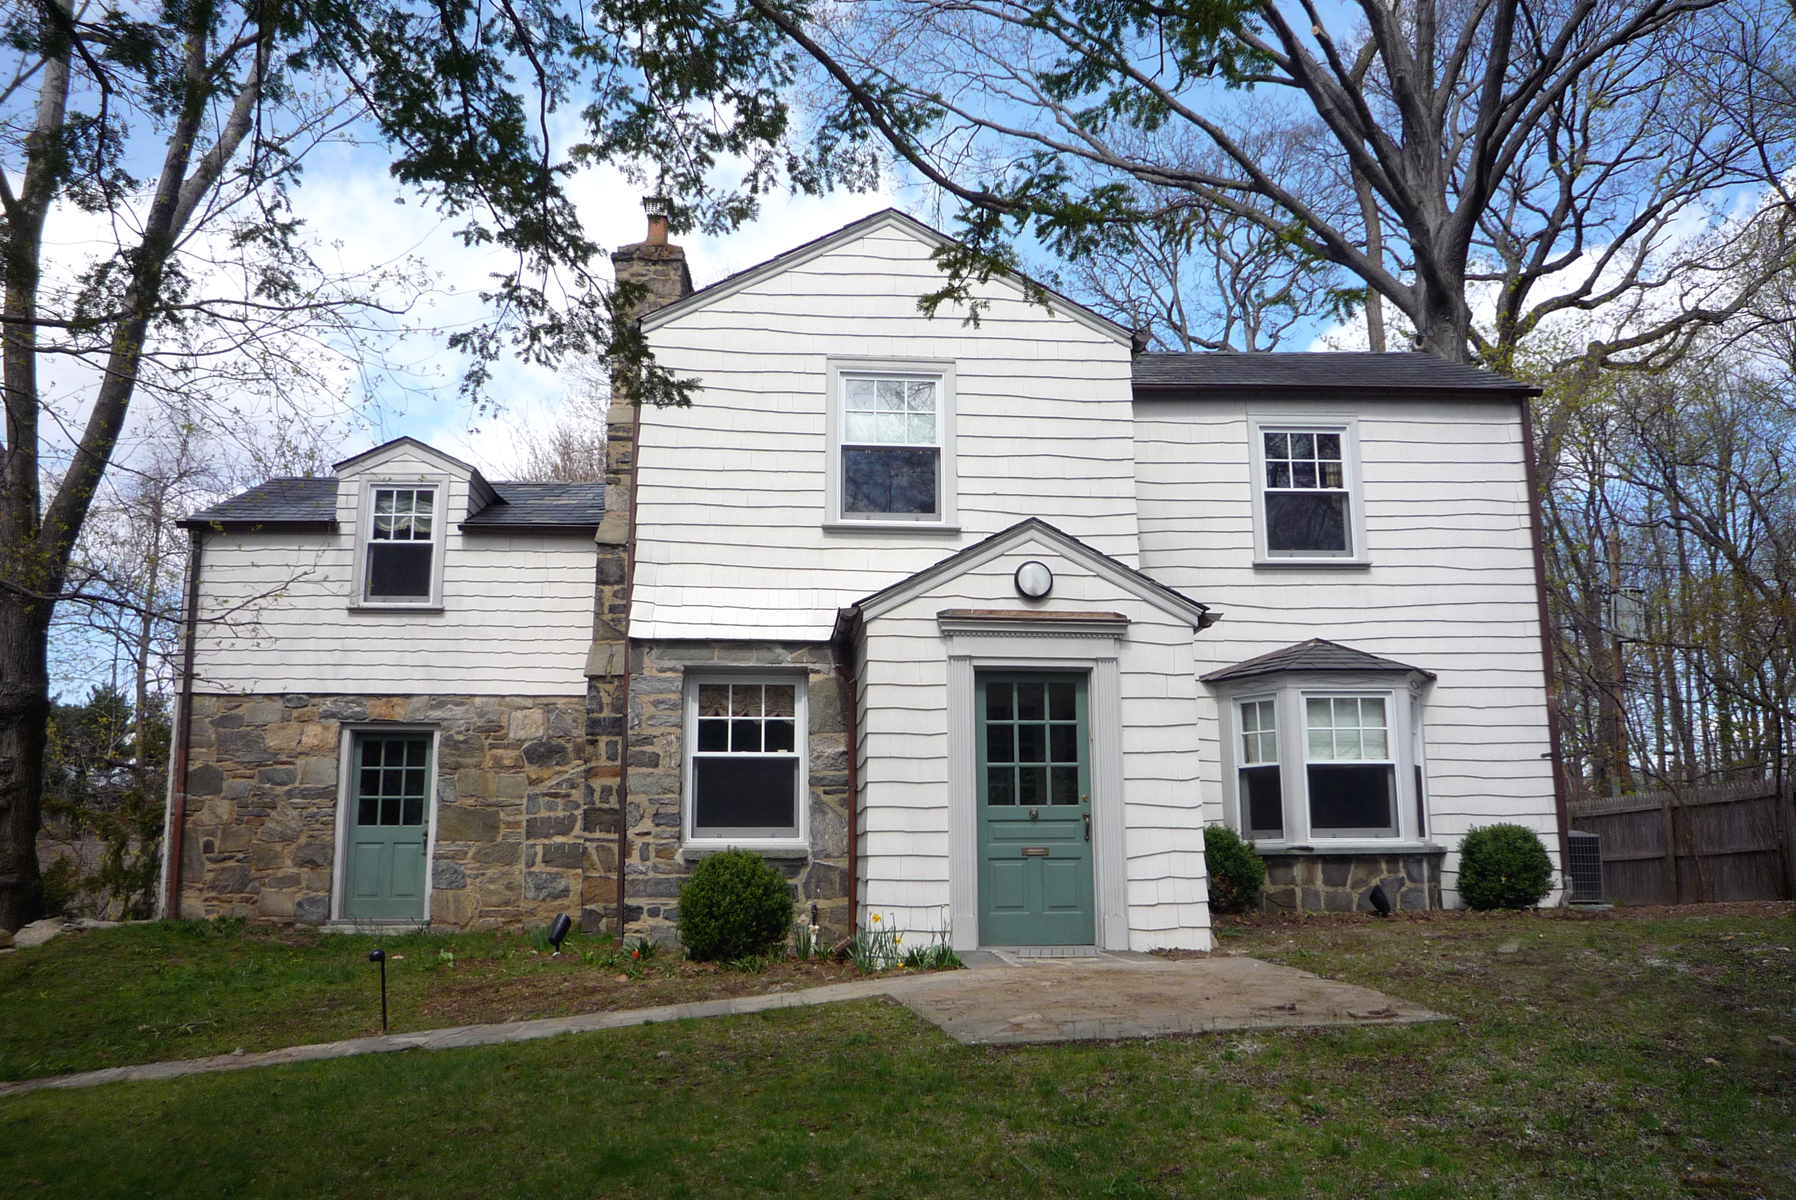 Renovated 4-Bd. Stone, Brick & Shingle House w/ Patio & Garden on Leafy Cul-de-Sac